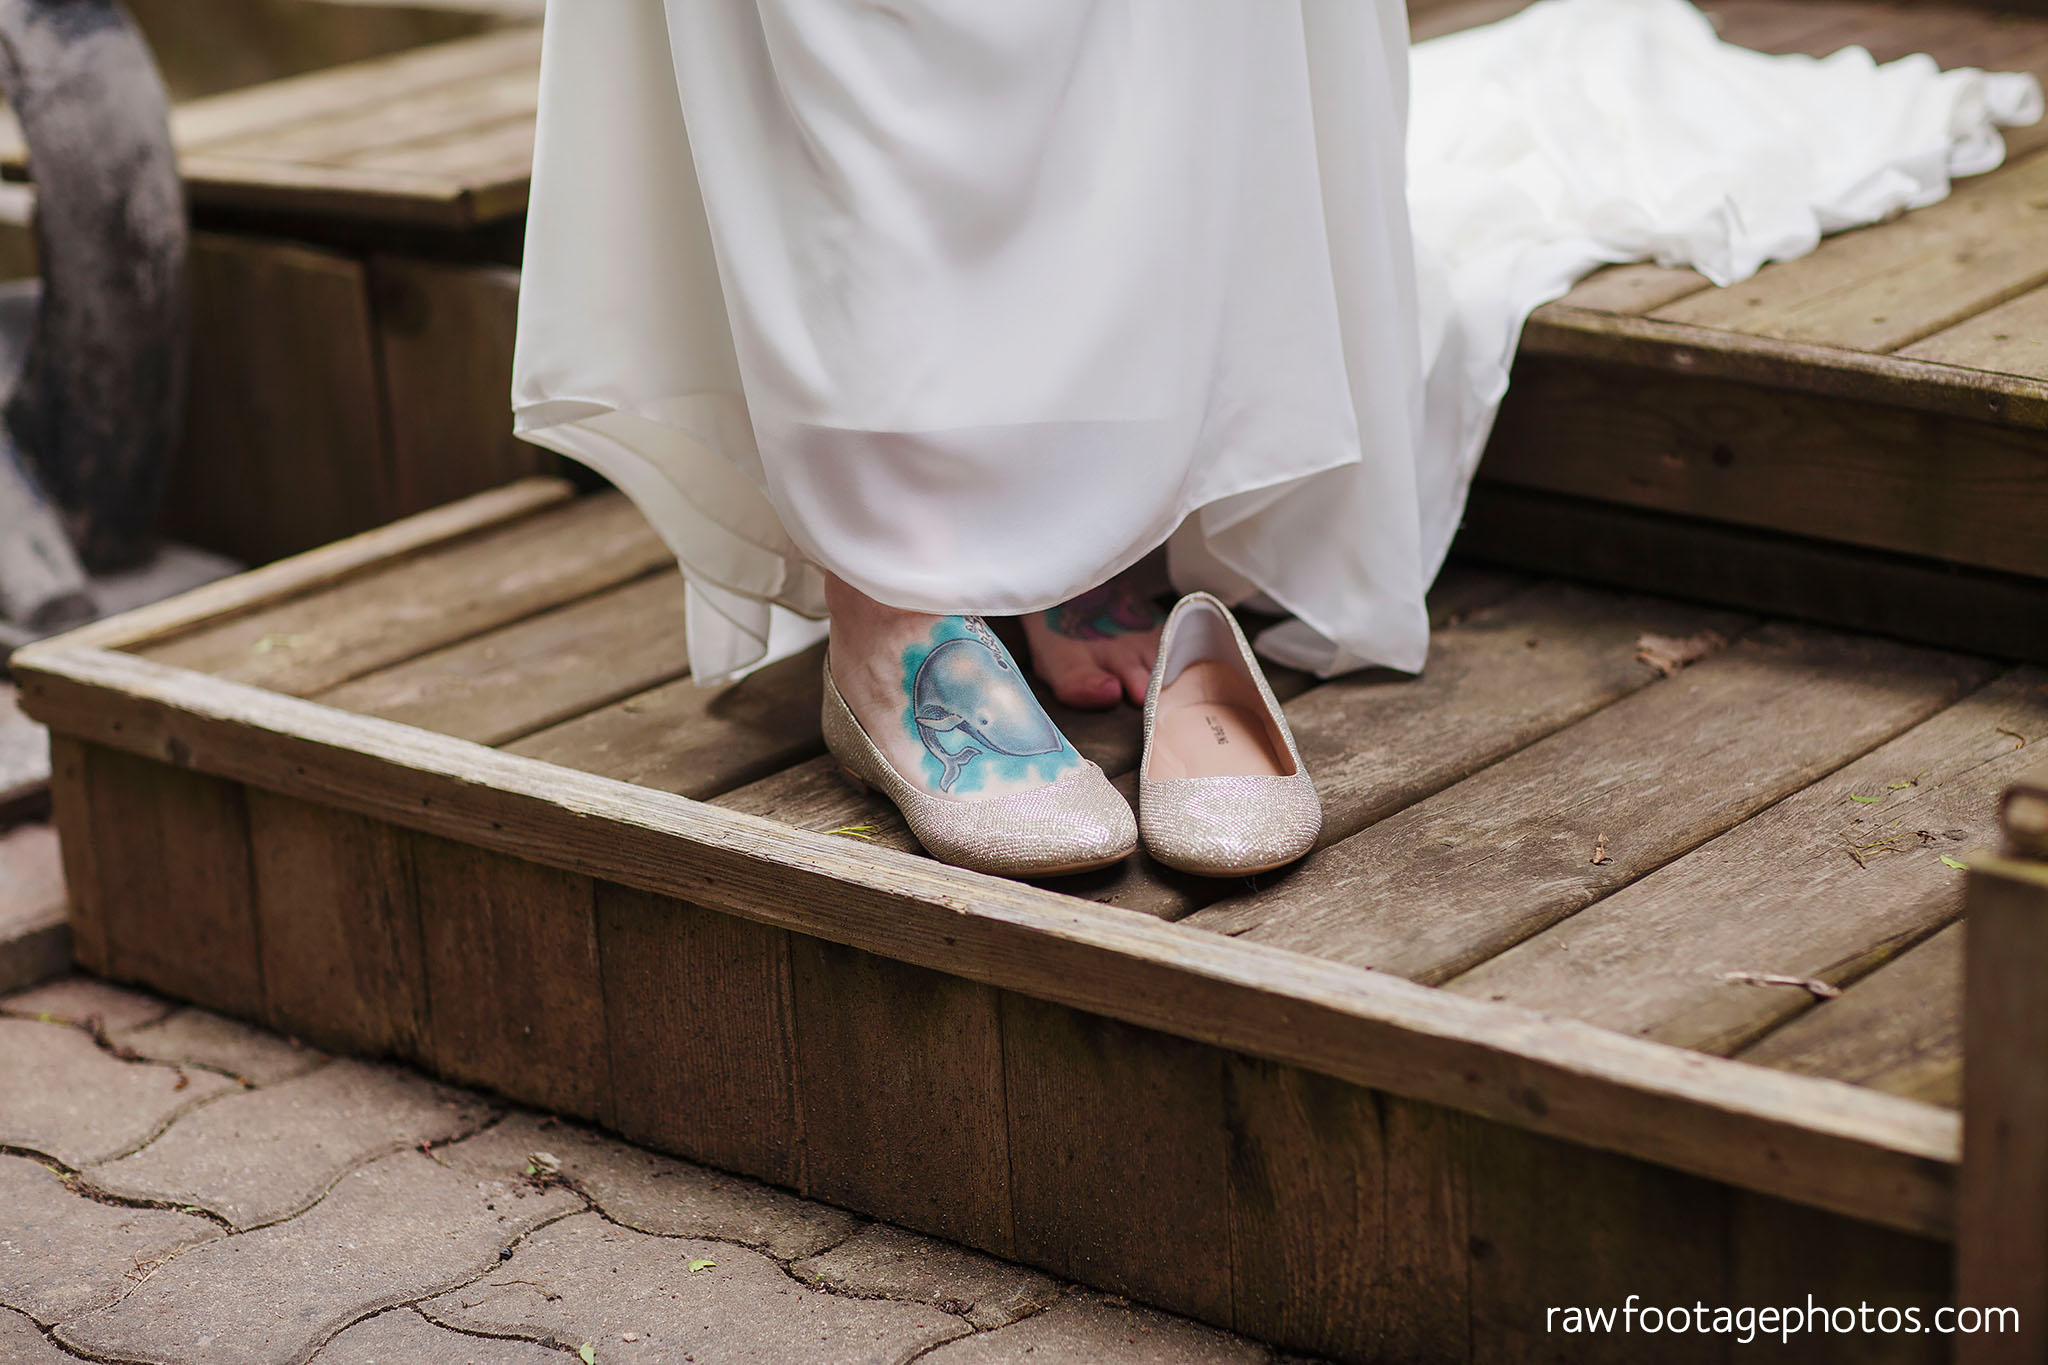 london_ontario_wedding_photographer-century_wedding_barn-raw_footage_photography-diy_wedding021.jpg